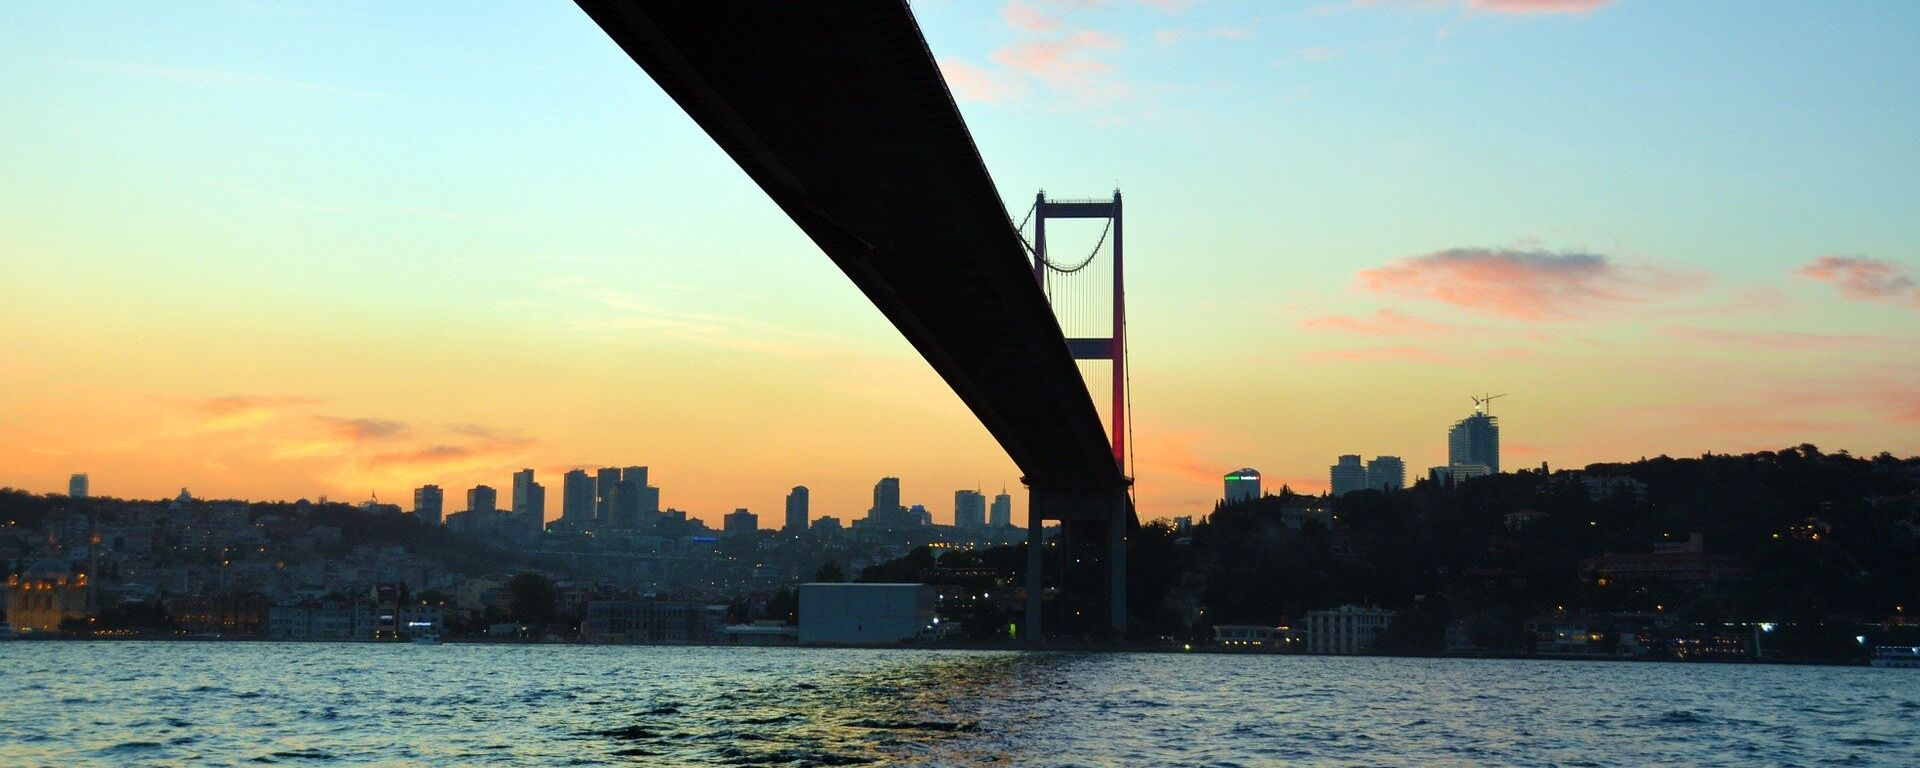 El estrecho de Bósforo en Estambul - Sputnik Mundo, 1920, 28.05.2021